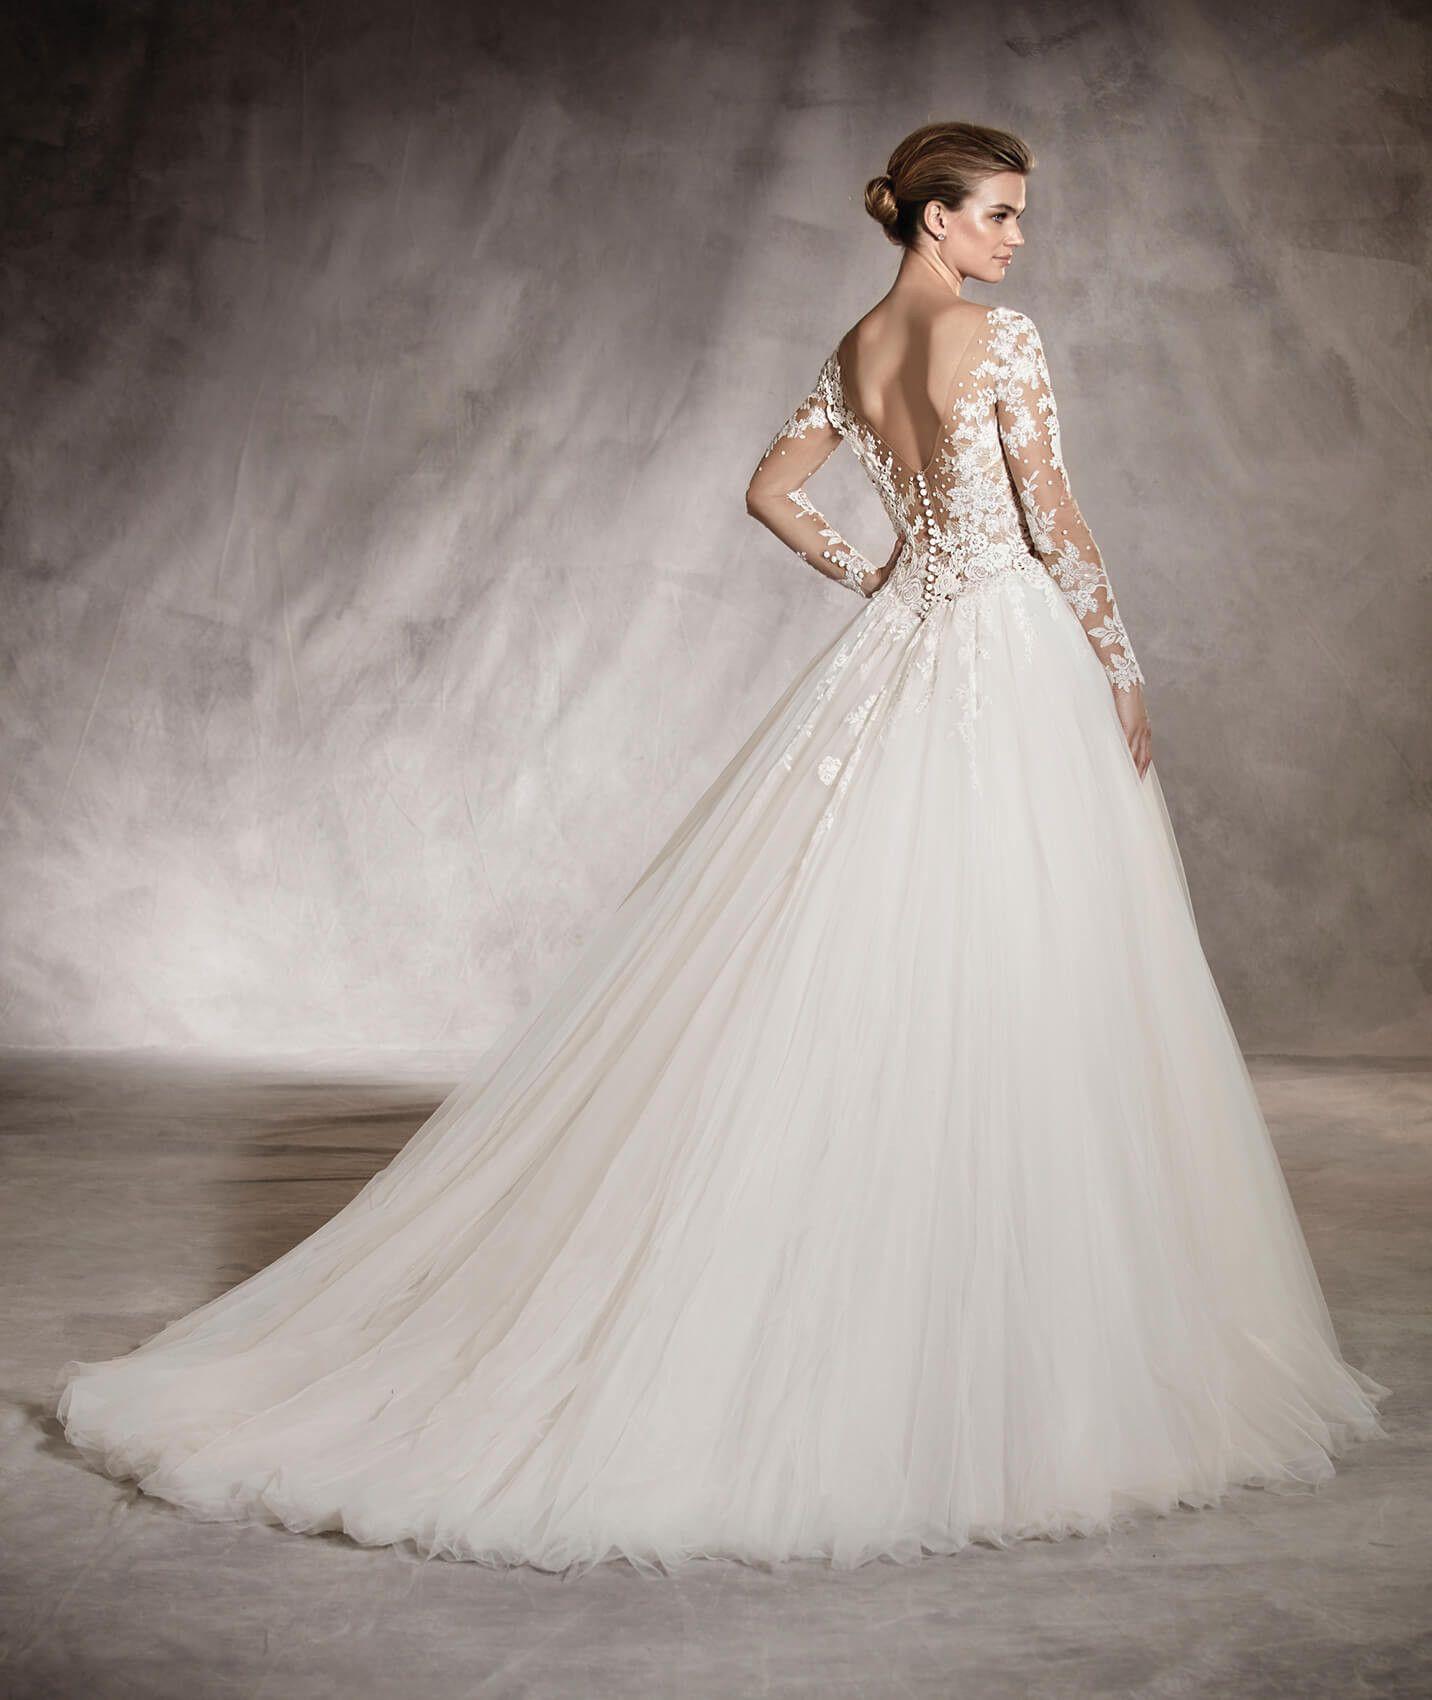 Arlene princess wedding dress with a vneckline in the back in